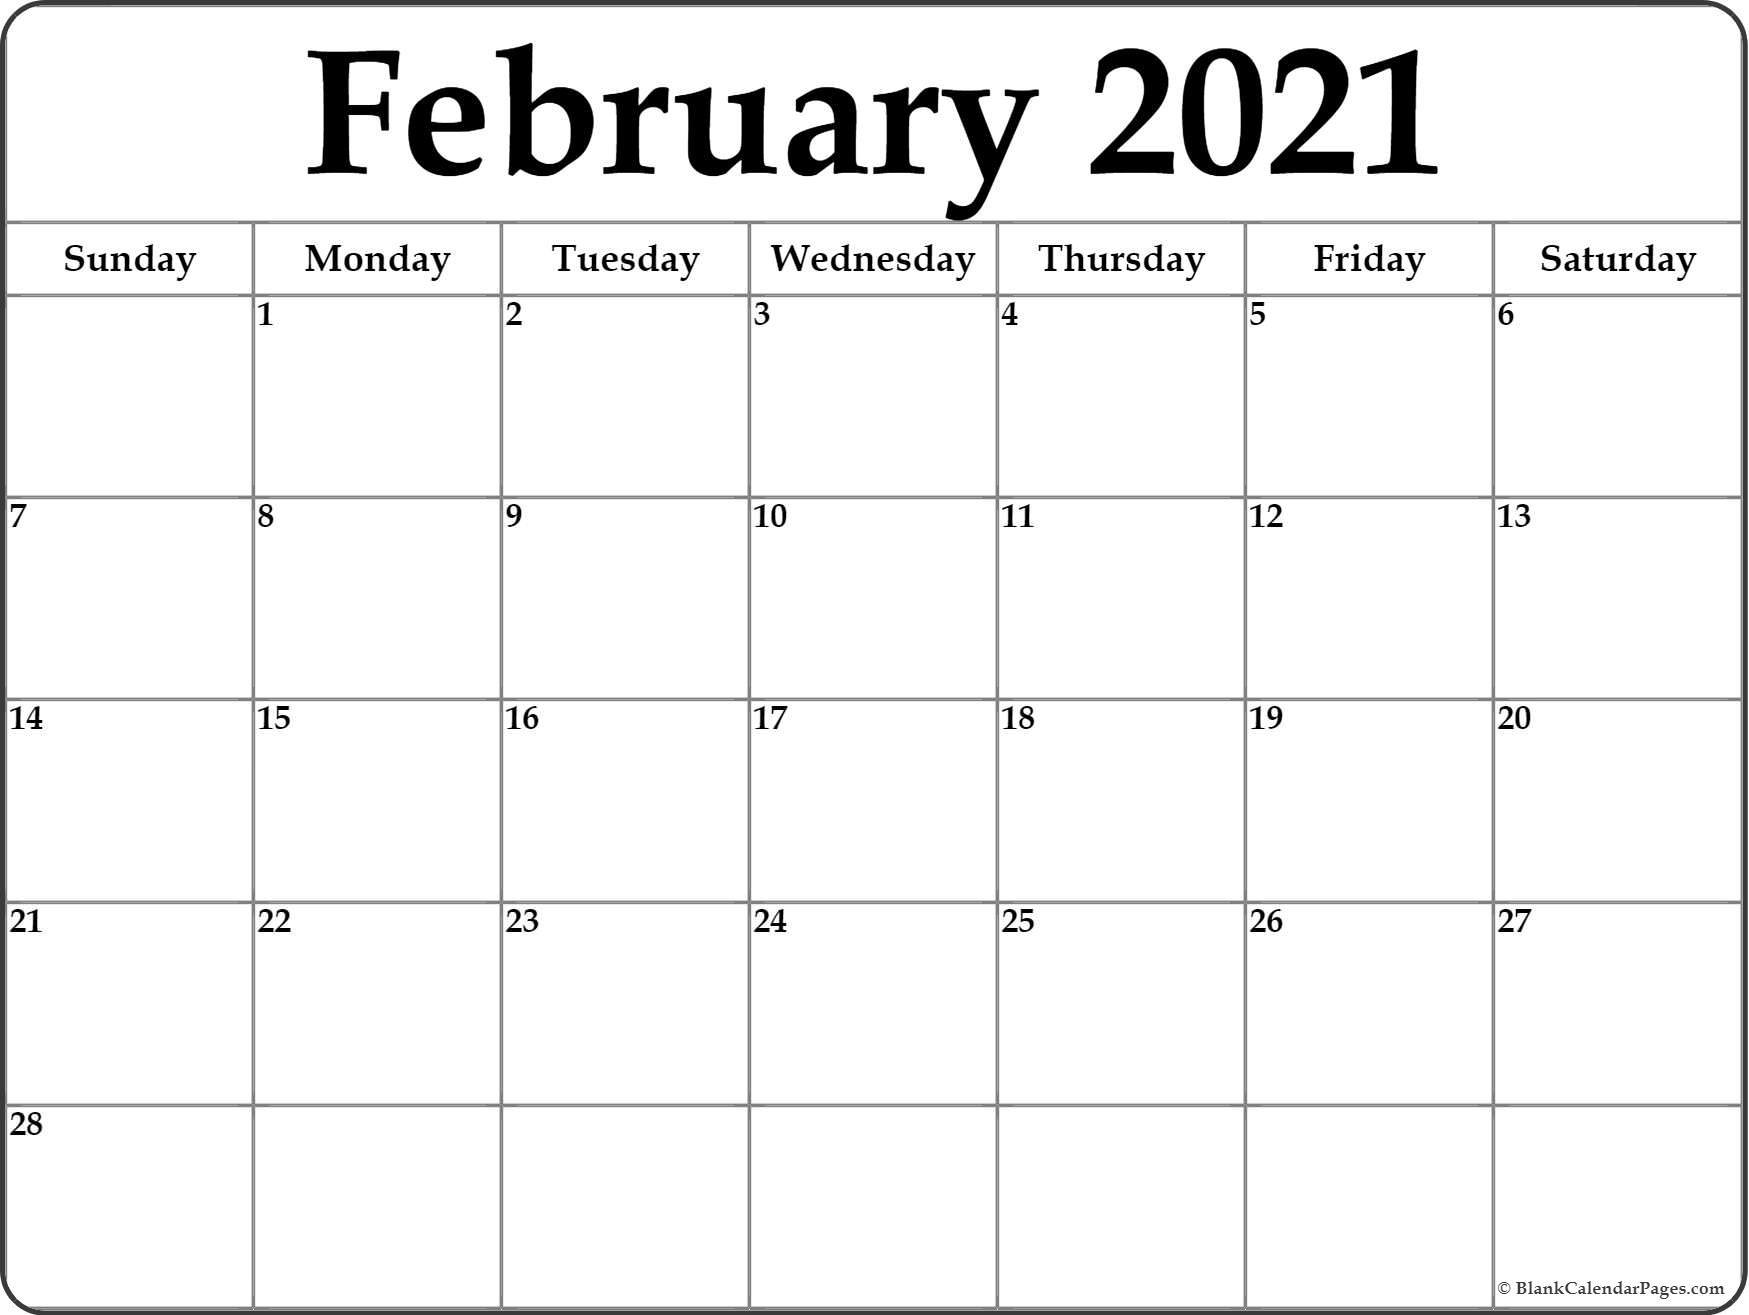 February 2021 Calendar | Free Printable Monthly Calendars-2021 Monthly Calendar Template Word